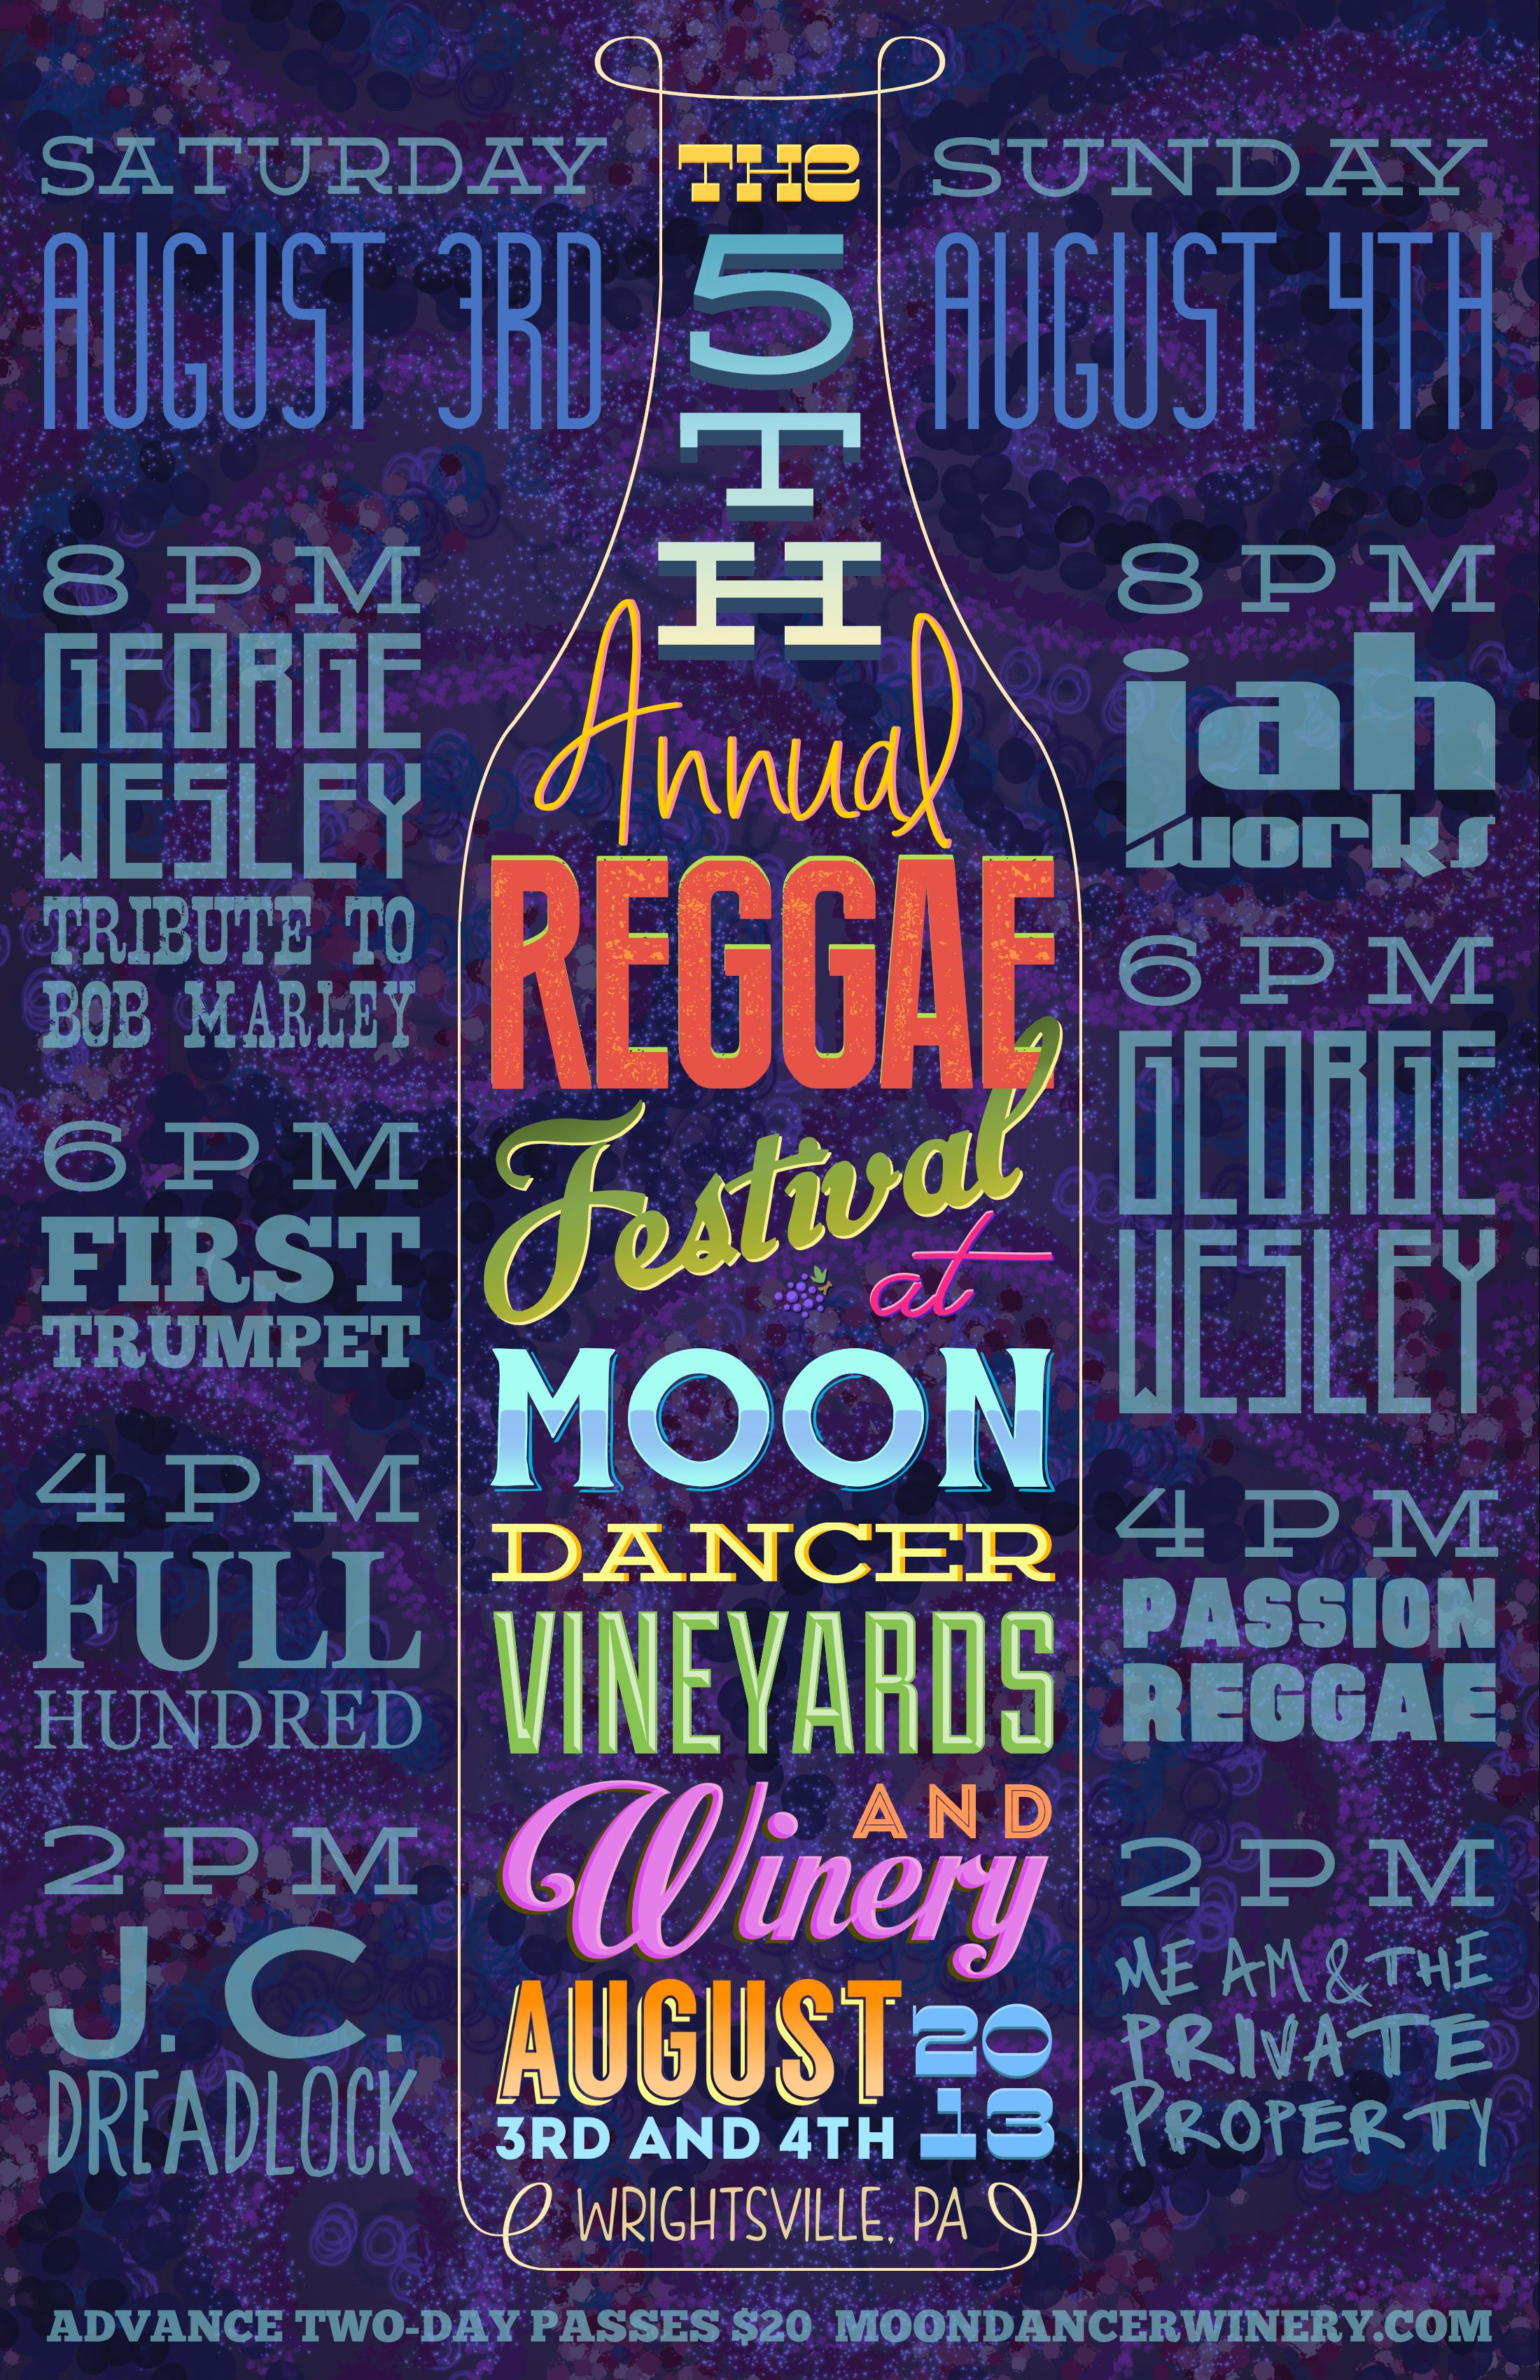 Reggae Festival @ Moon Dancer Winery by Corey Salzano